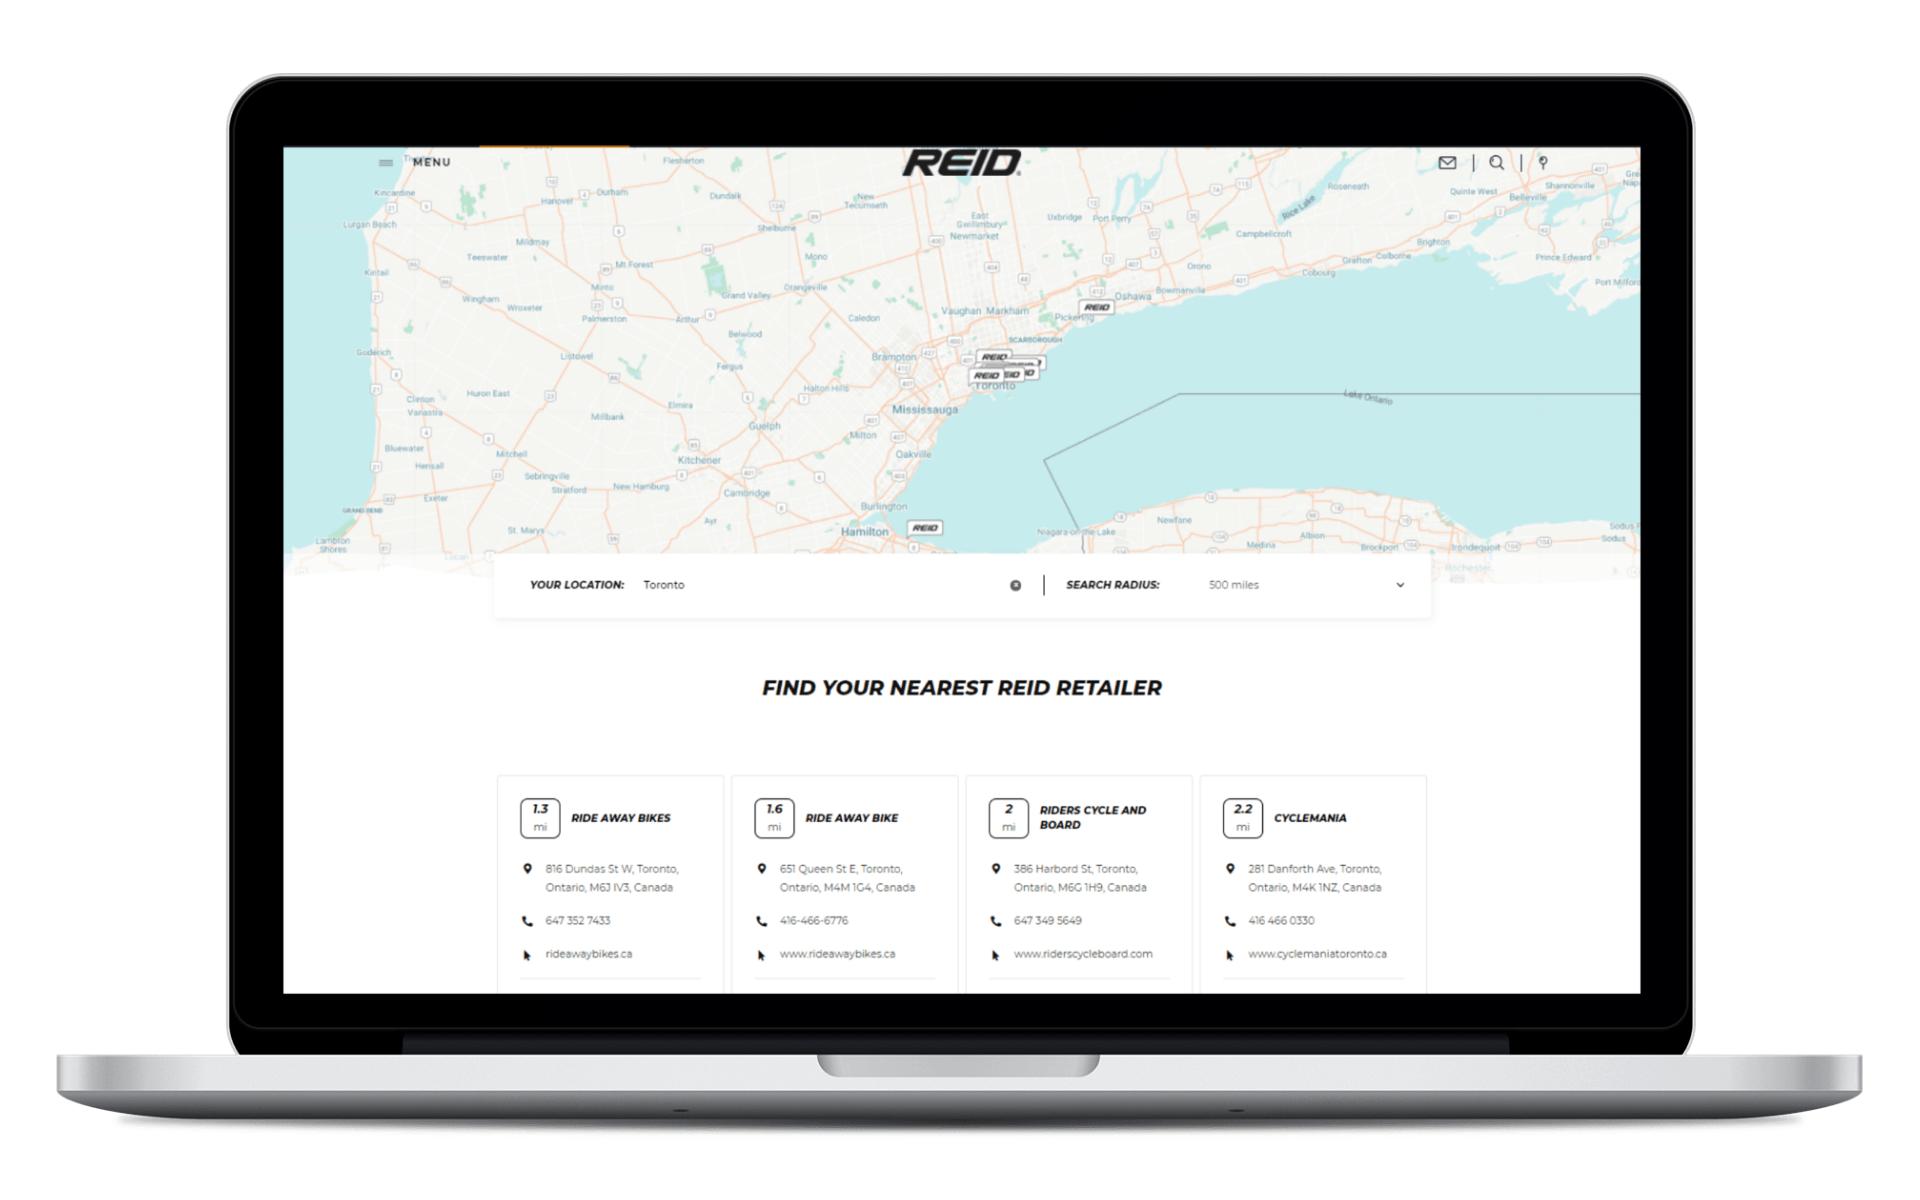 Untitled design 10 - Reid ® - Reid Launches Their New Website!